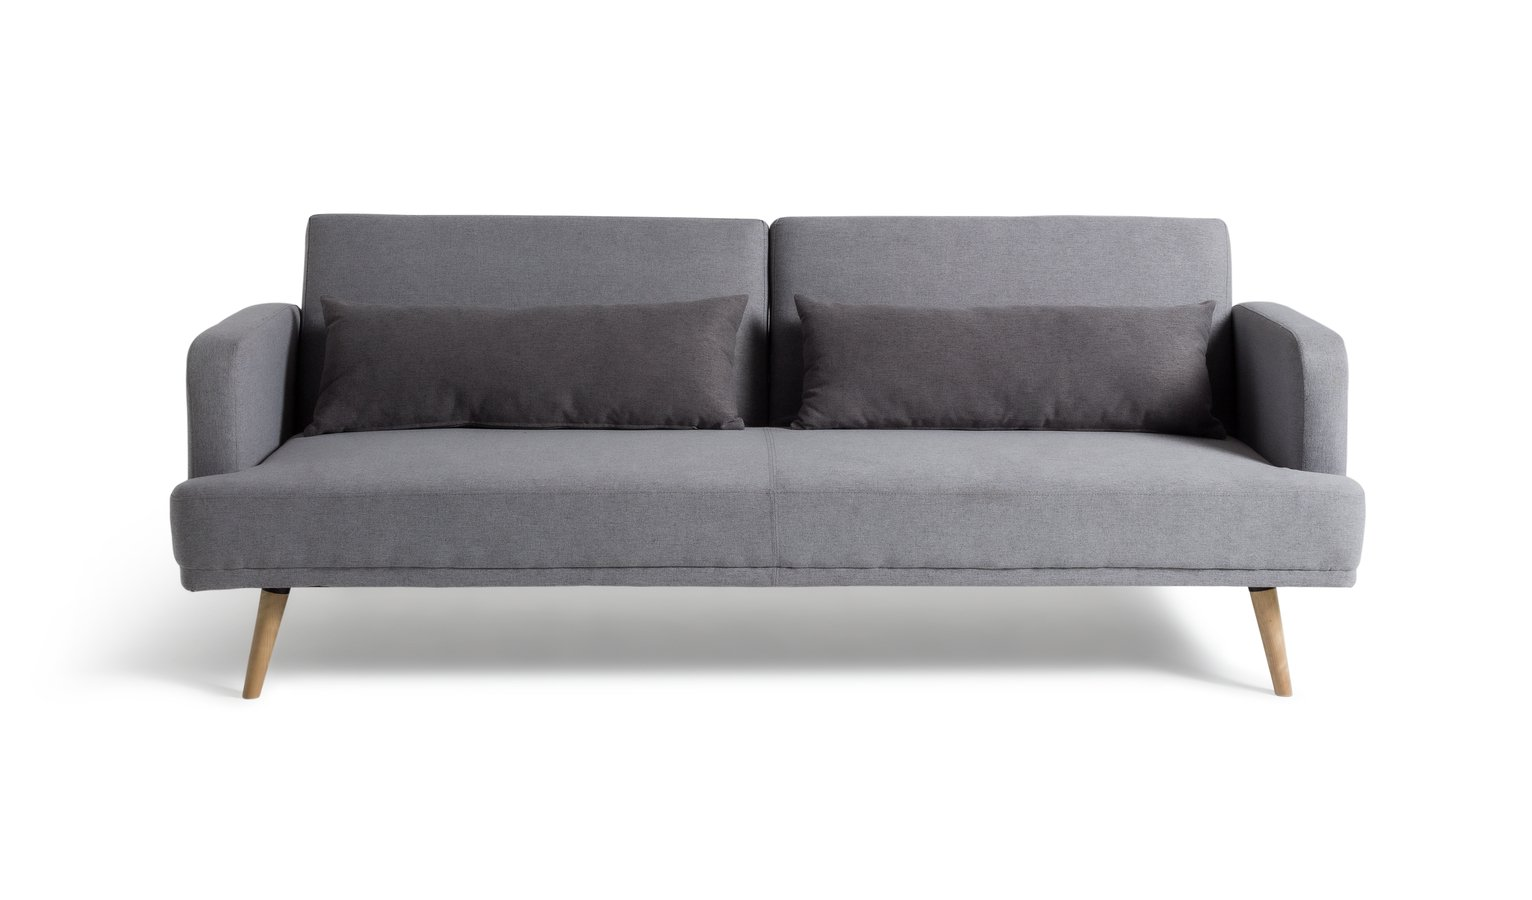 Habitat Andy 3 Seater Fabric Clic Clac Sofa Bed - Grey